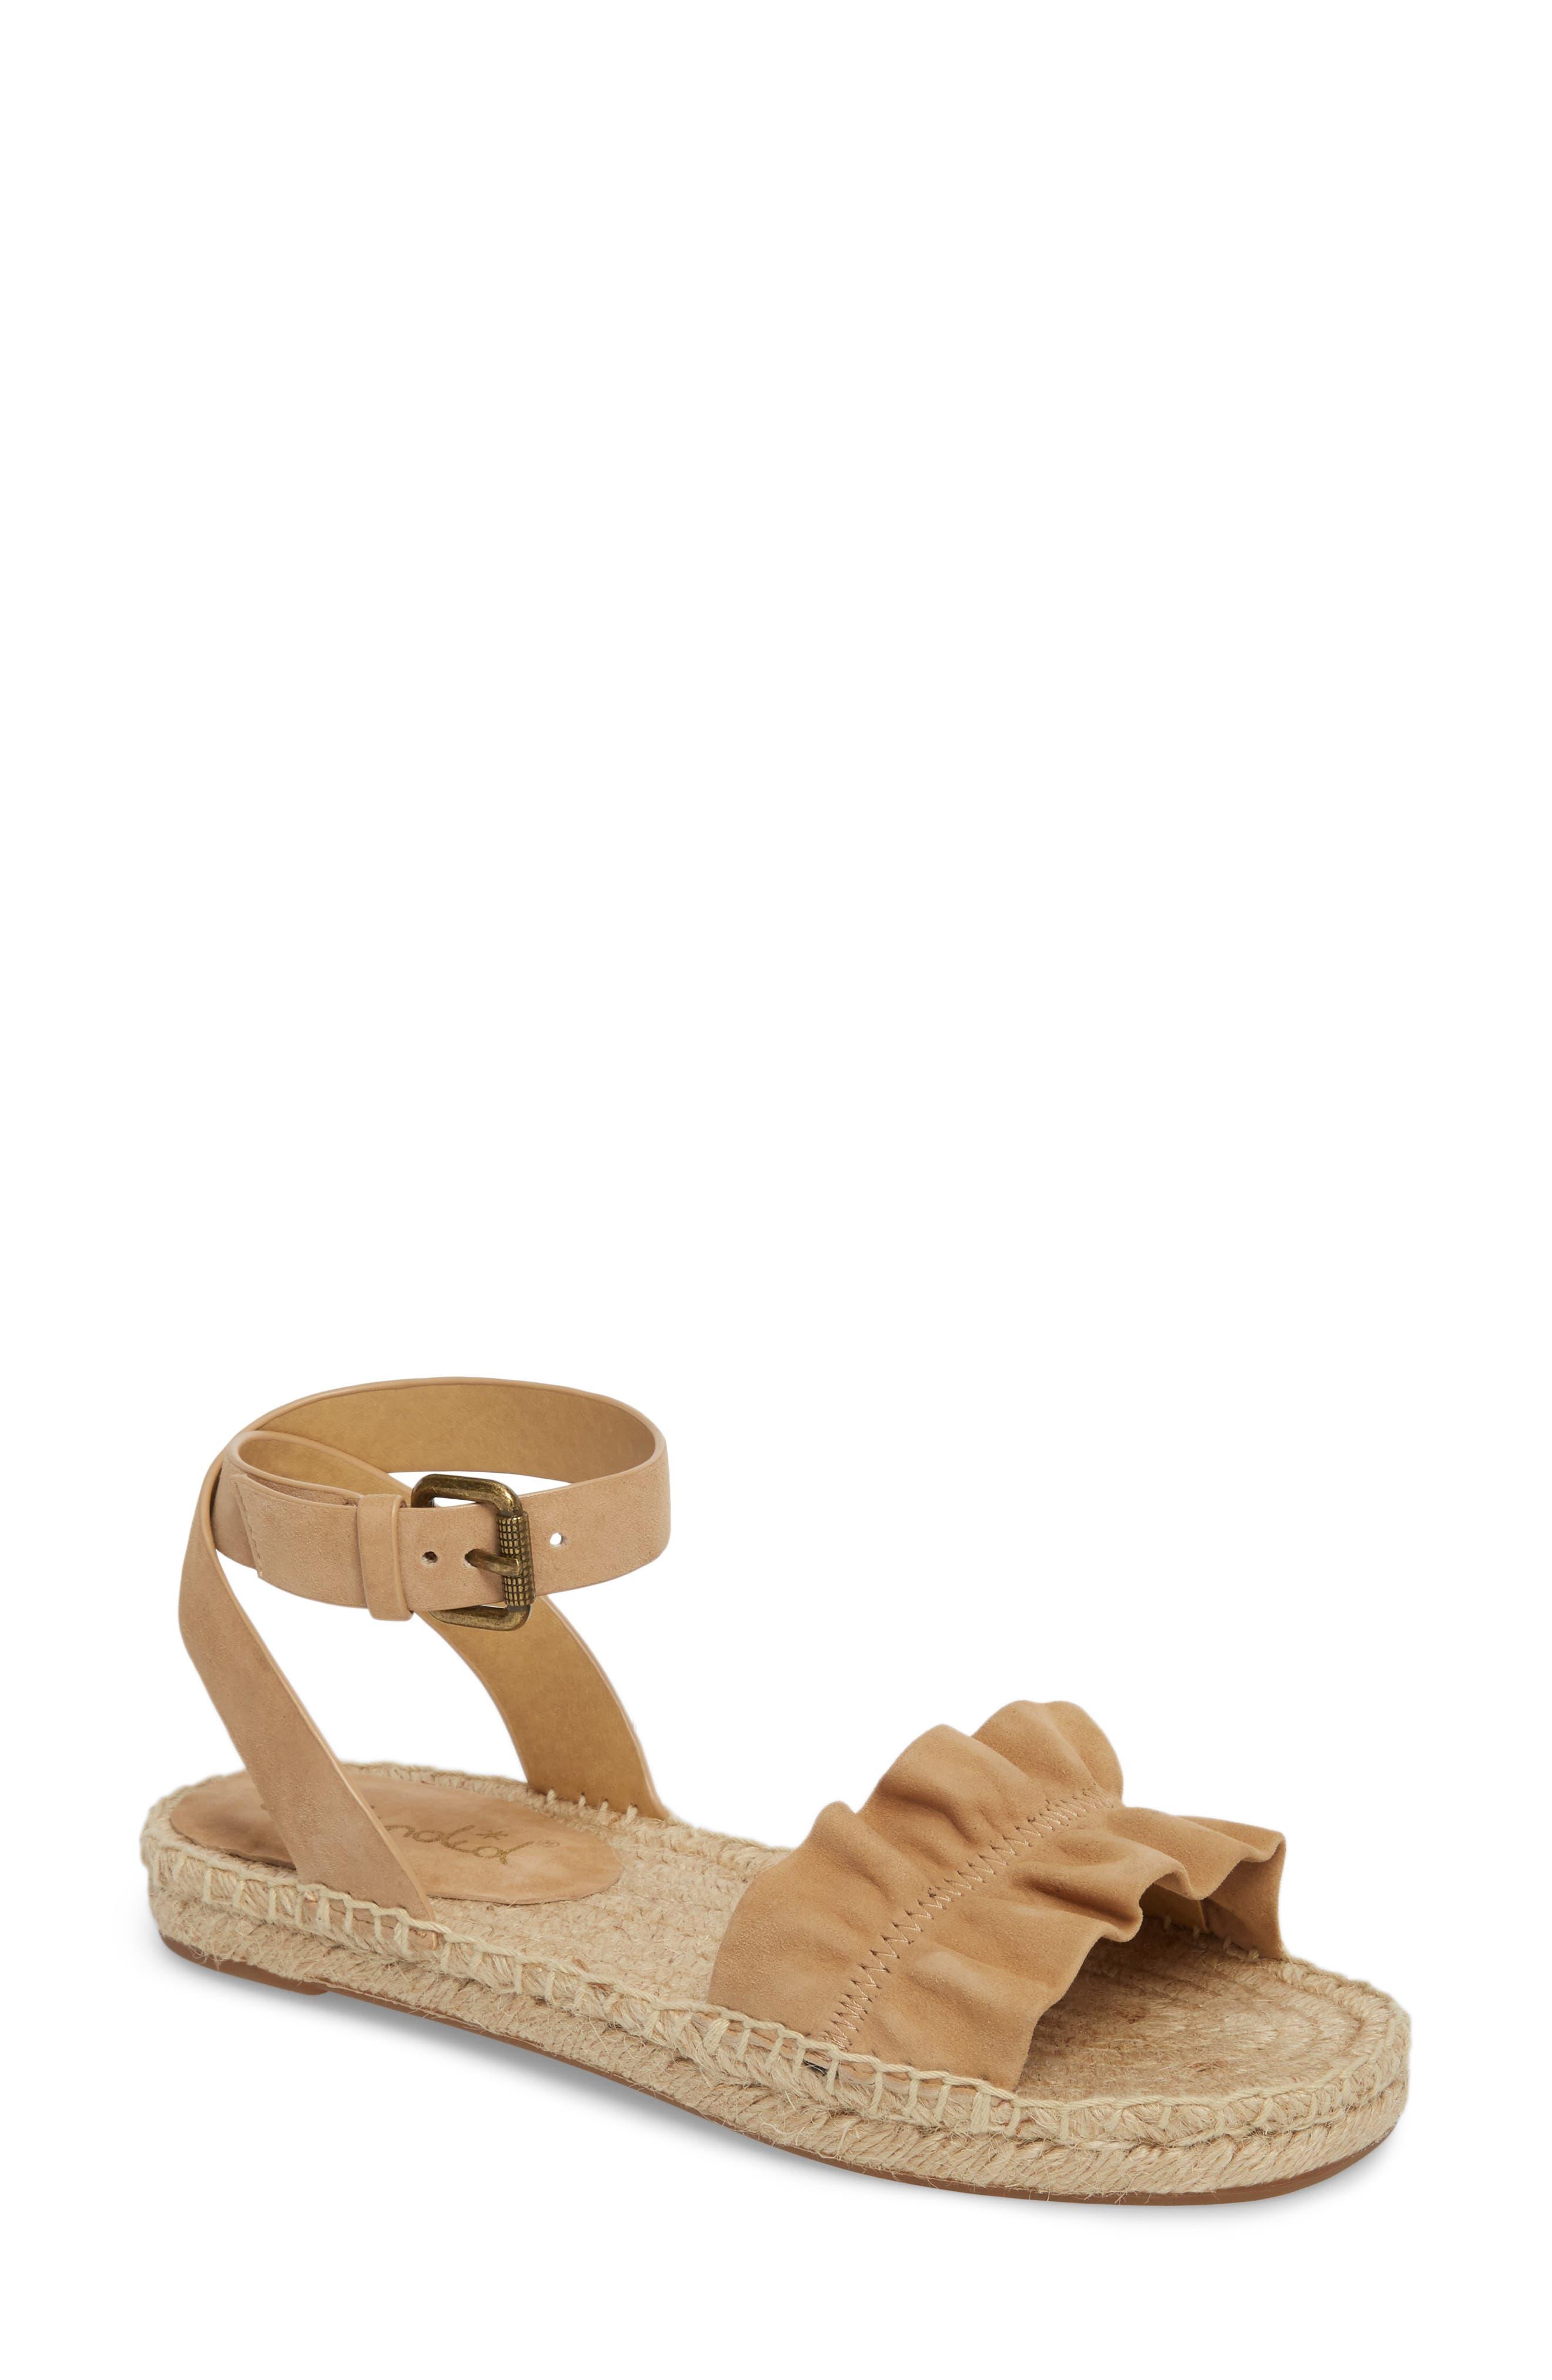 Becca Ruffled Espadrille Sandal,                         Main,                         color,